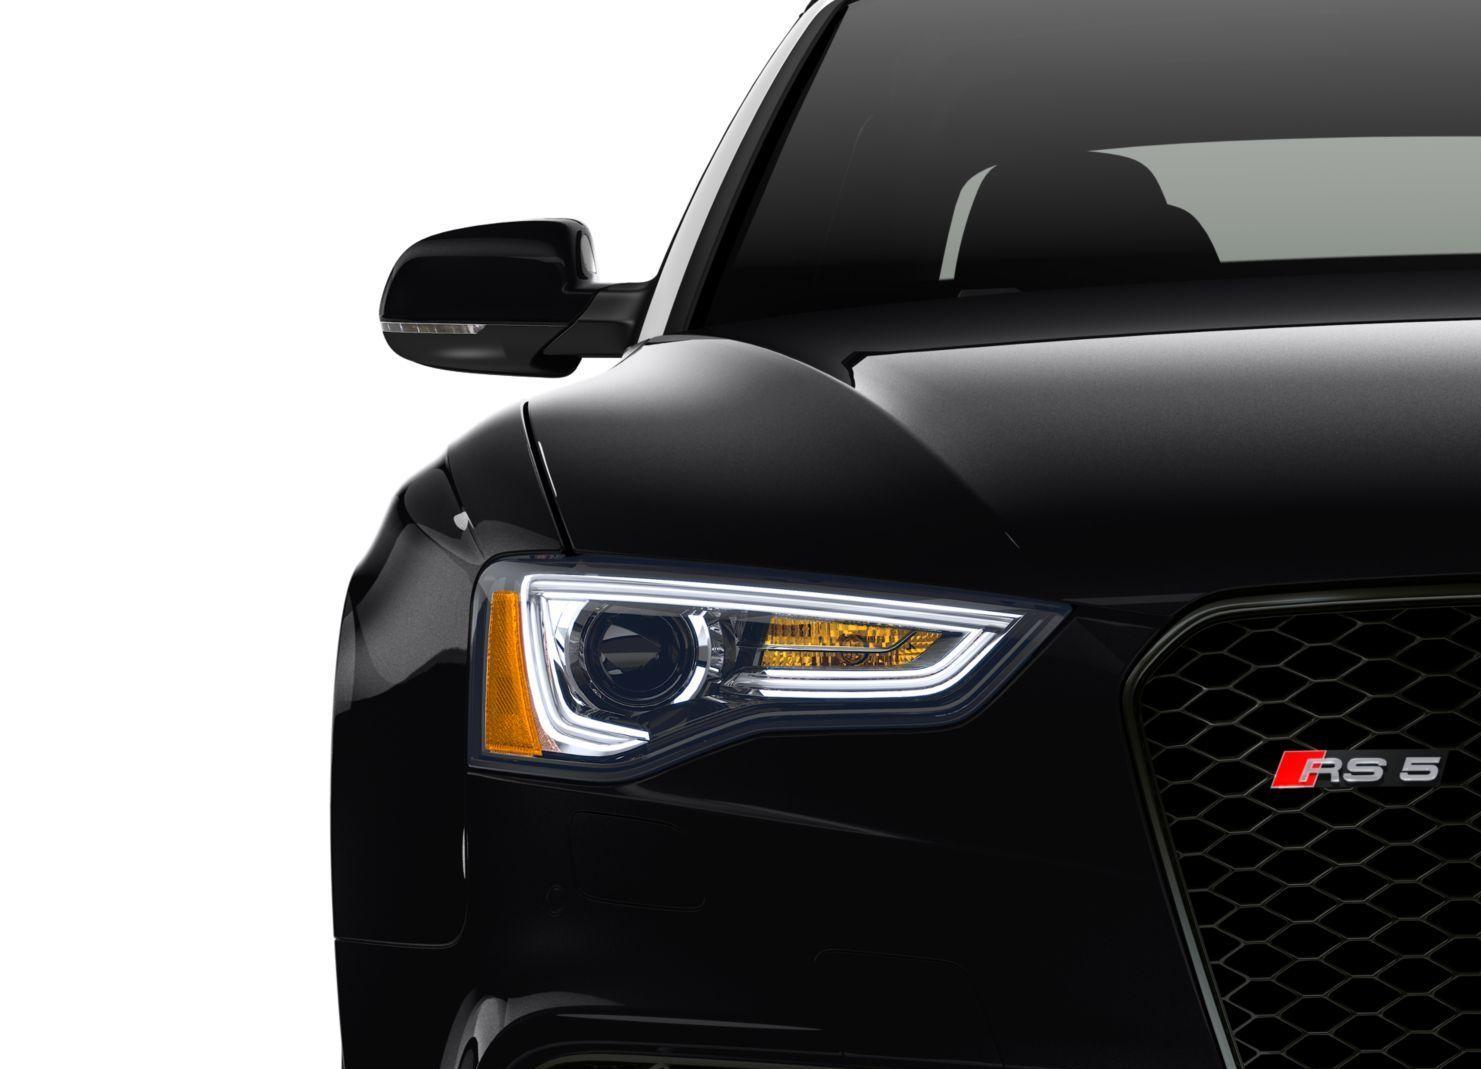 2014 Audi RS5 Cabriolet Buyers Guide - Black Optics vs Matte Aluminum Optics 62